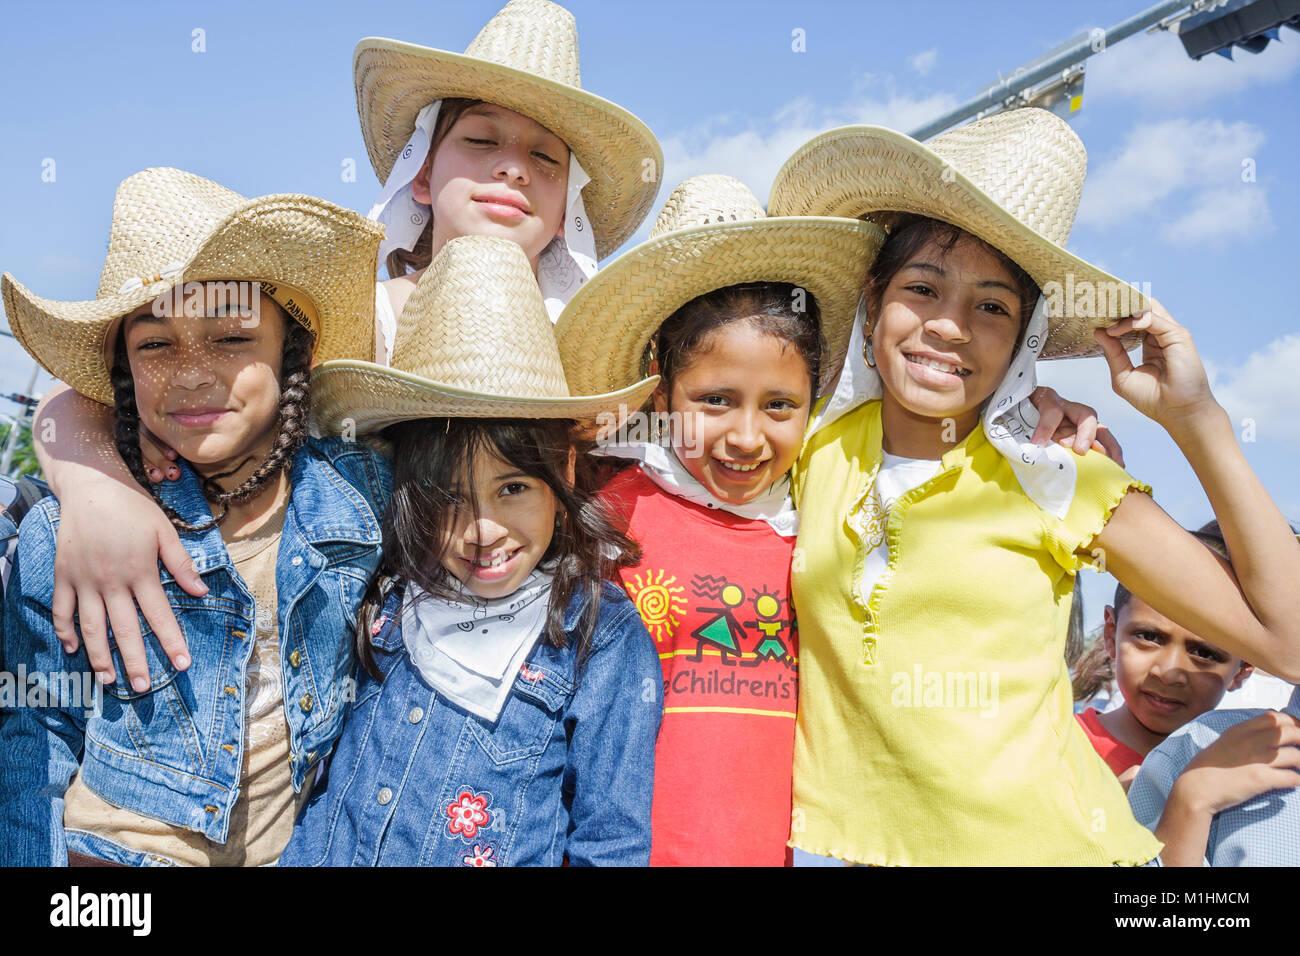 tradition Hispanic girls boy Mexican hats bandanas Western attire outfit - Stock Image